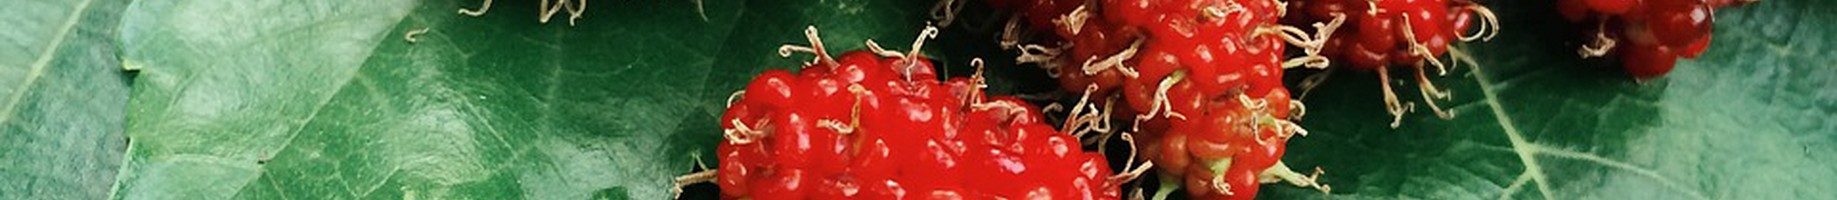 fruit-1835558_1280